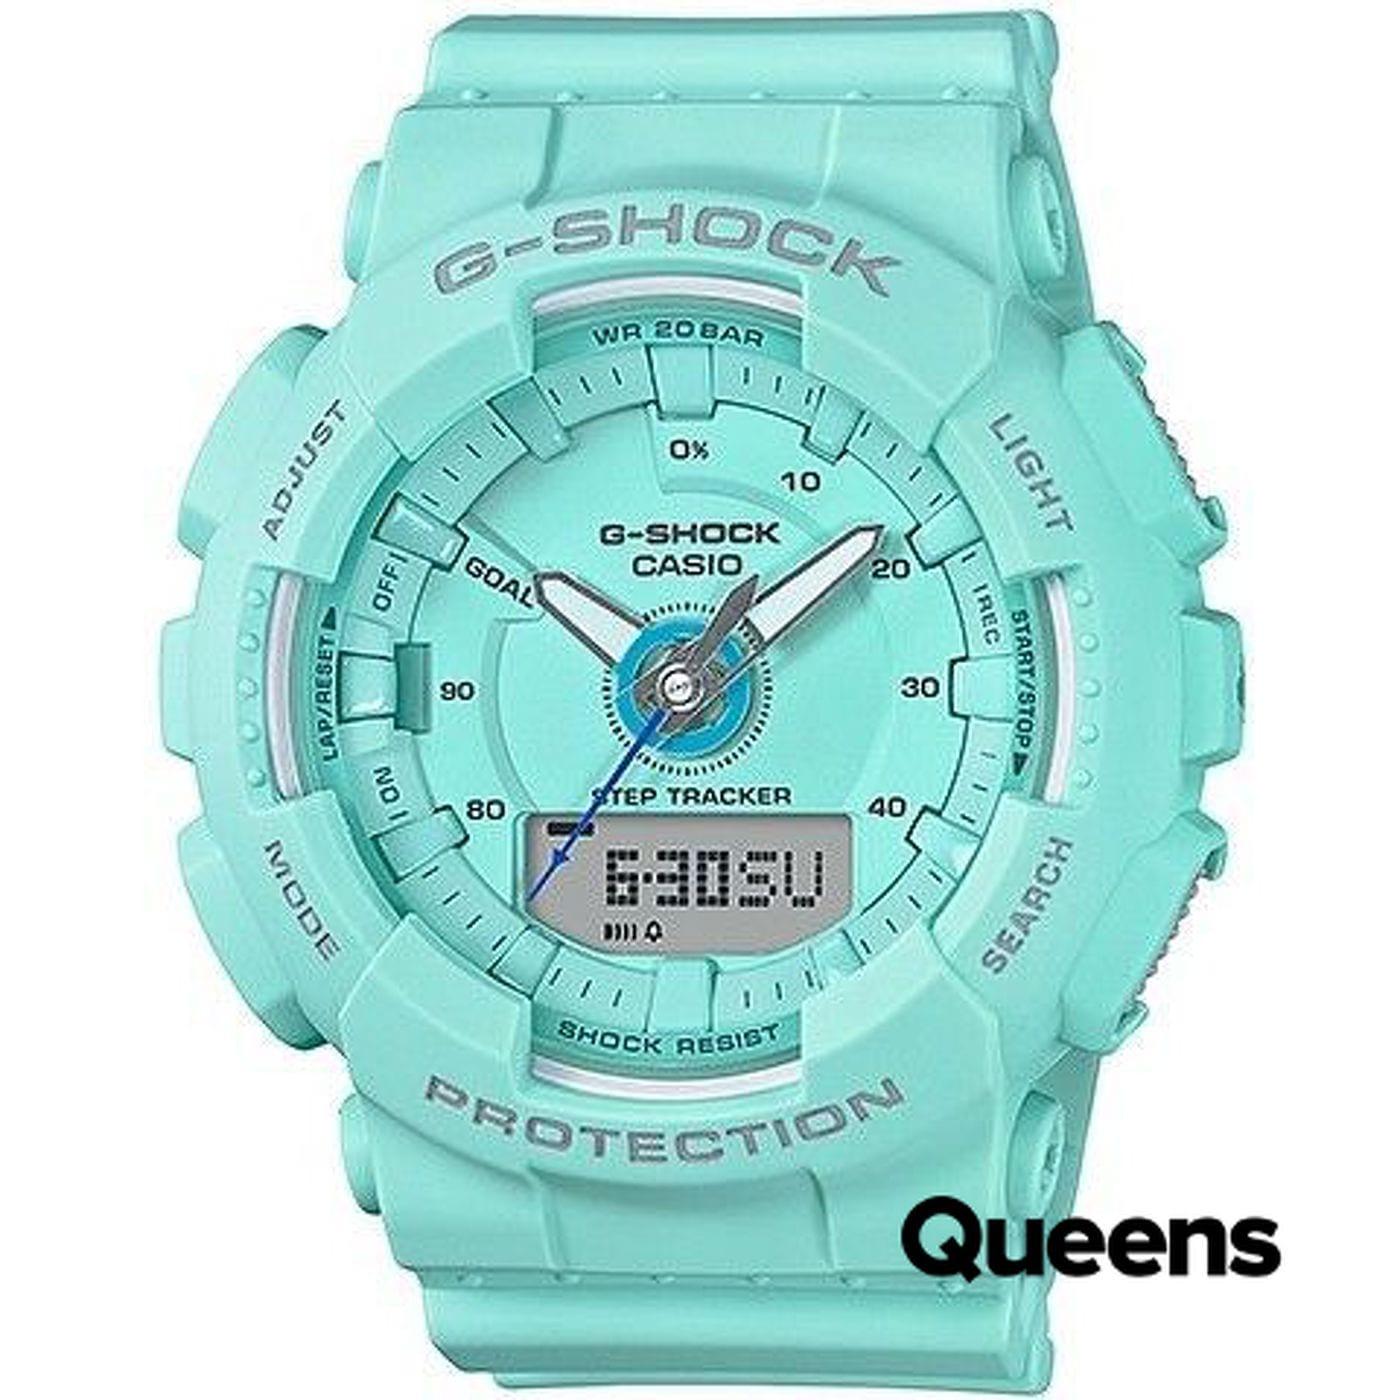 Hodinky Casio G-Shock GMA S130-2AER – Queens 💚 d71d579b68